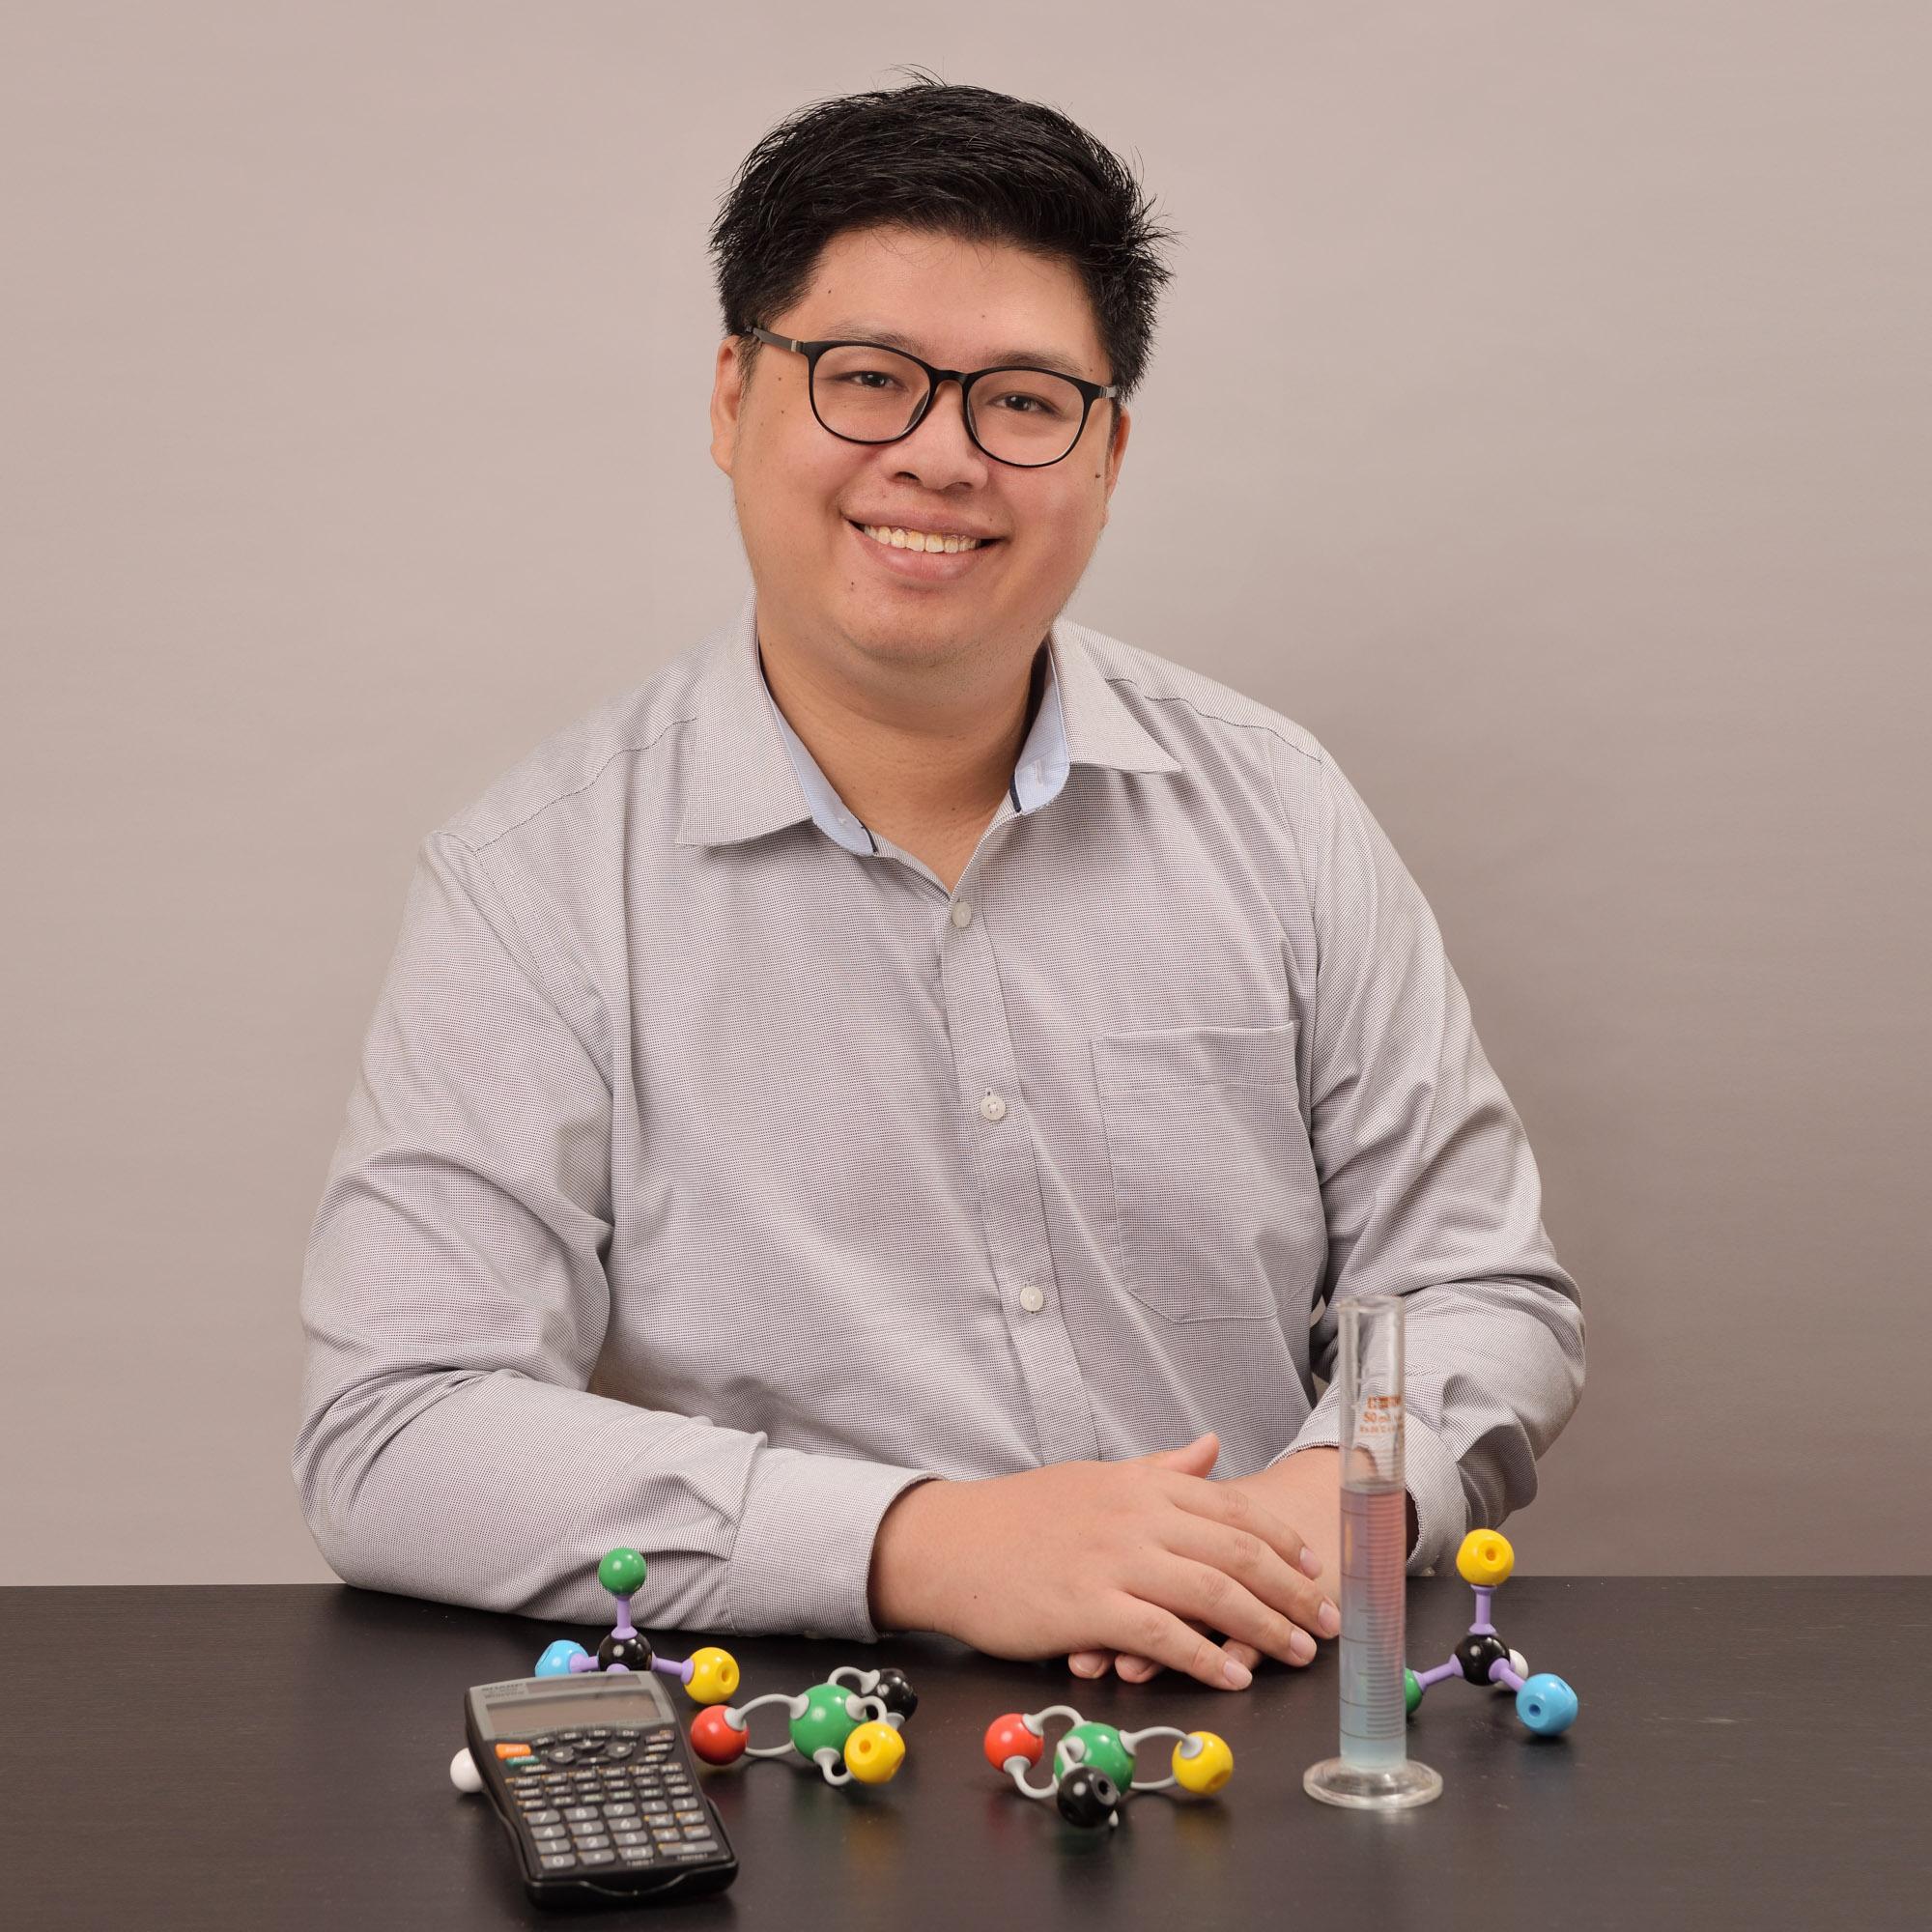 KEN YI LIM - CHEMISTRY